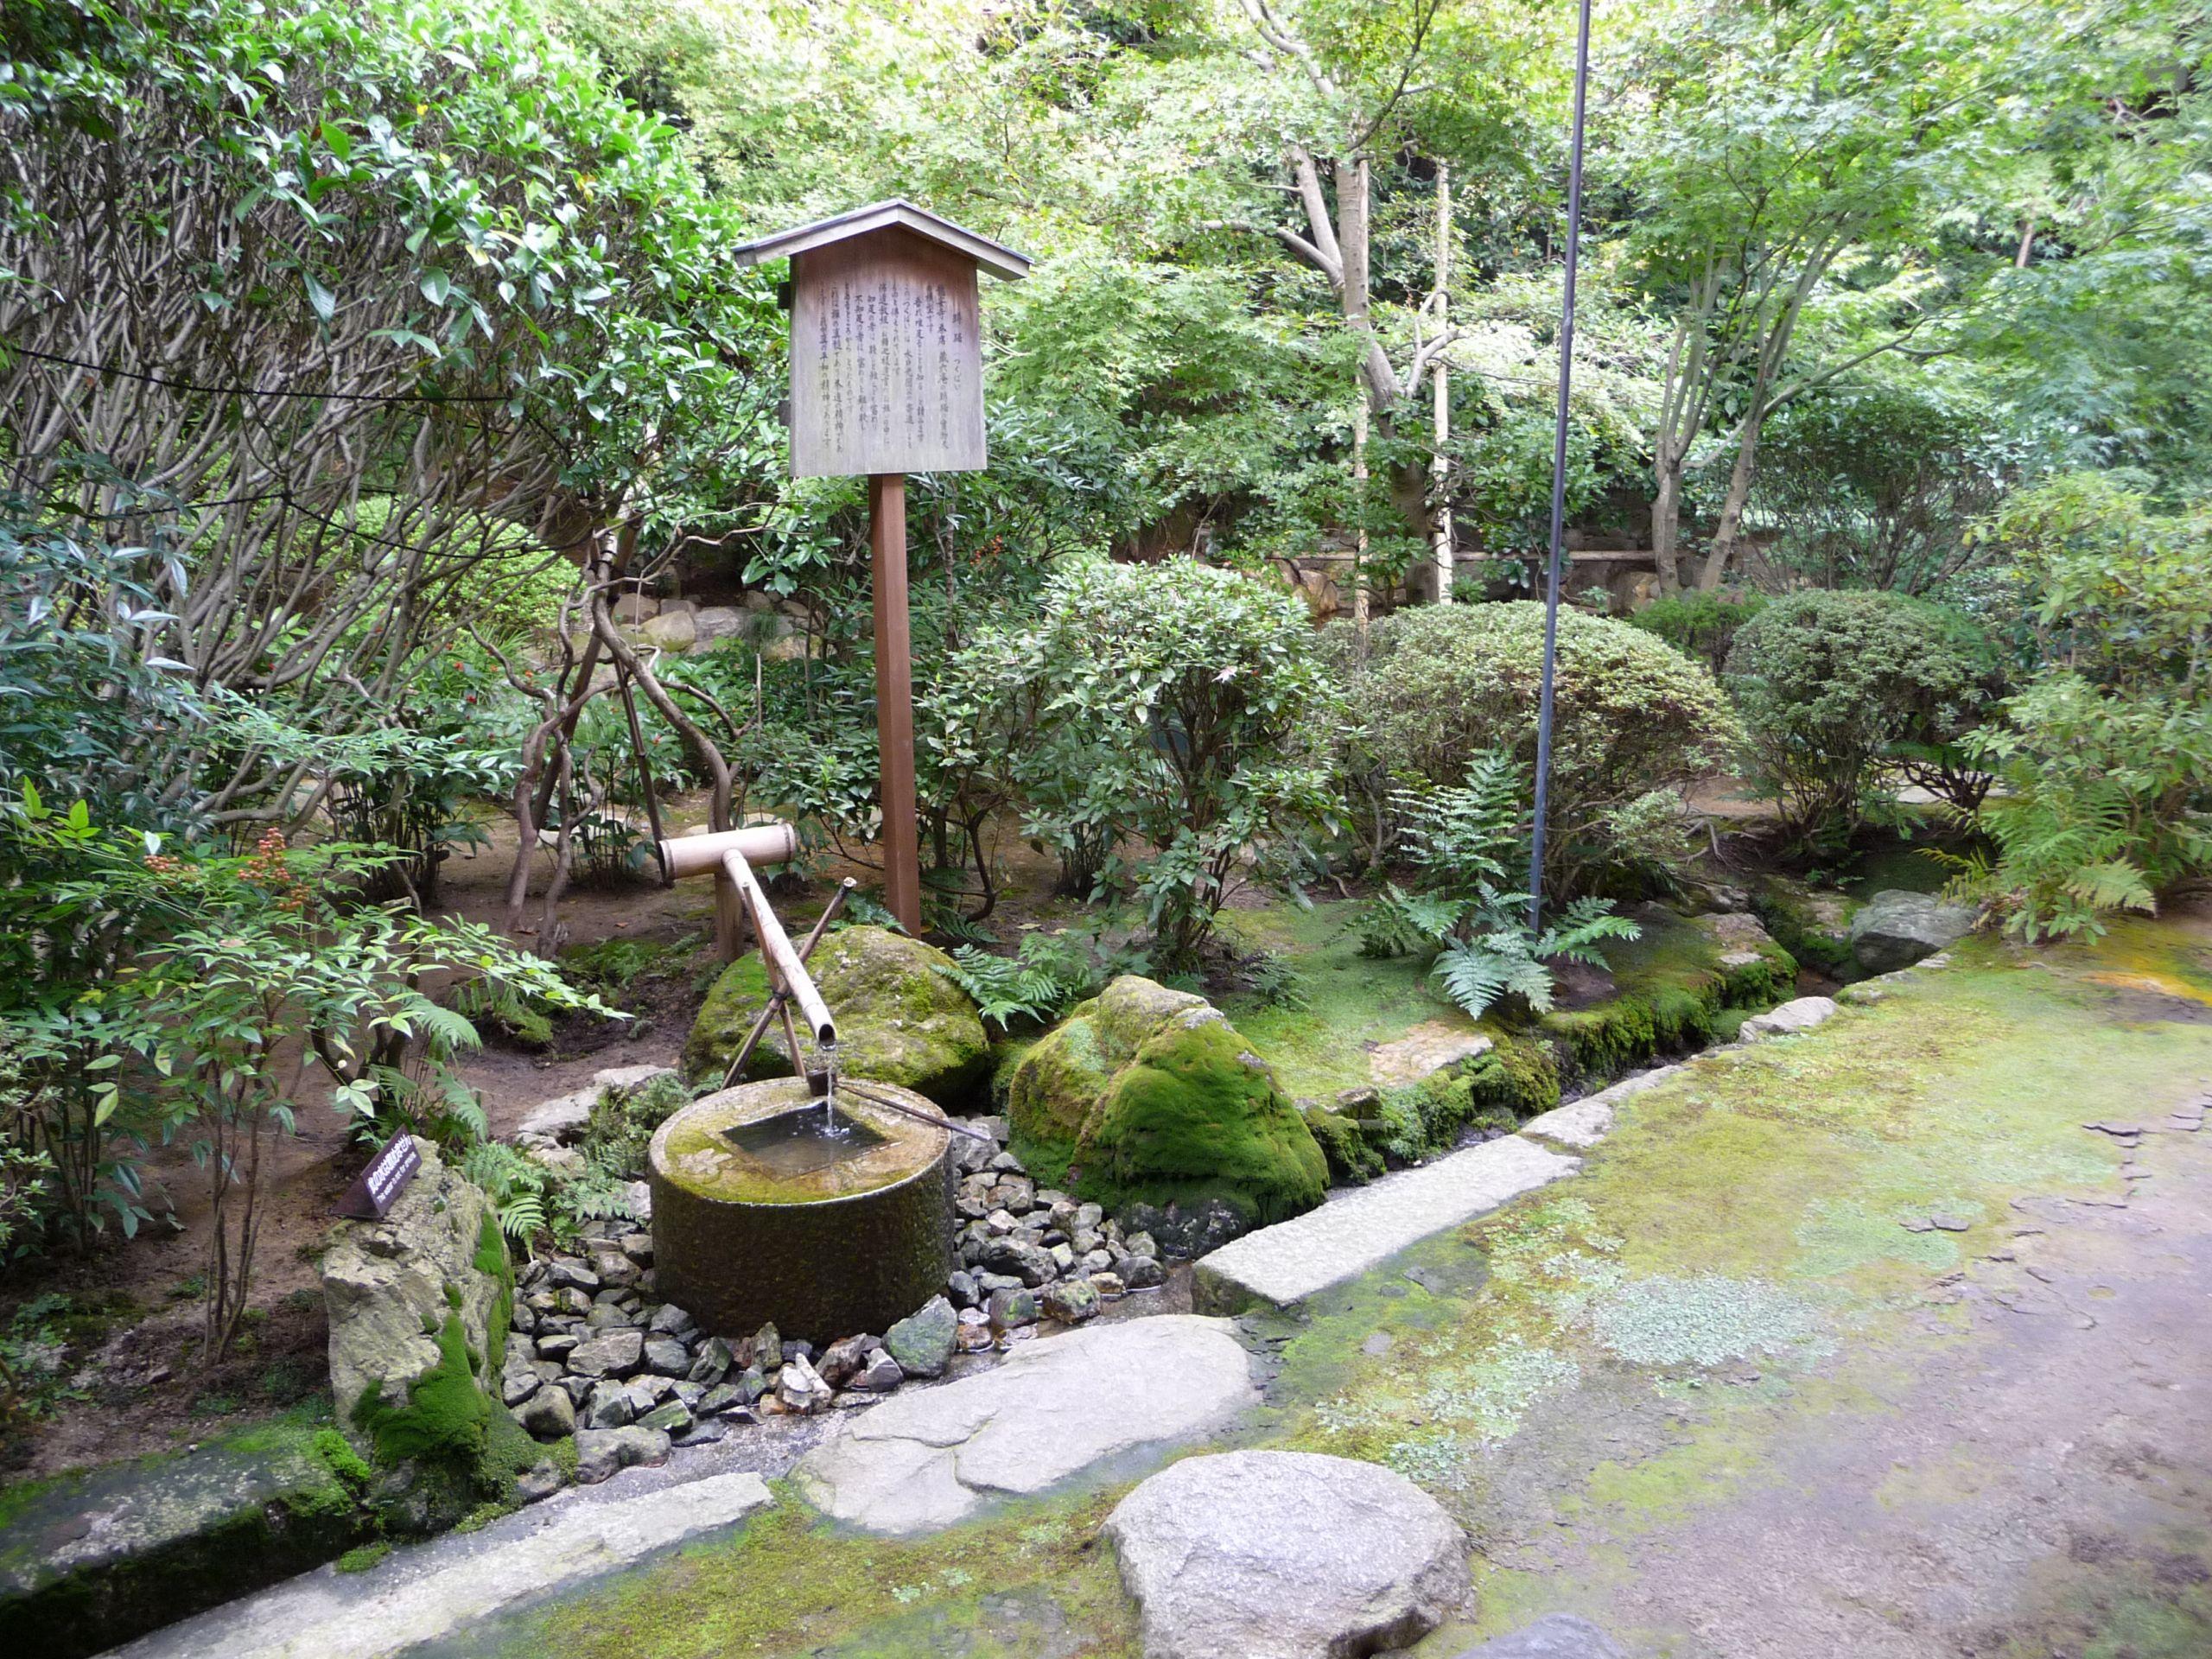 Kyoto jour 2 Kinkaku ji Ryōan ji et Ginkakuji